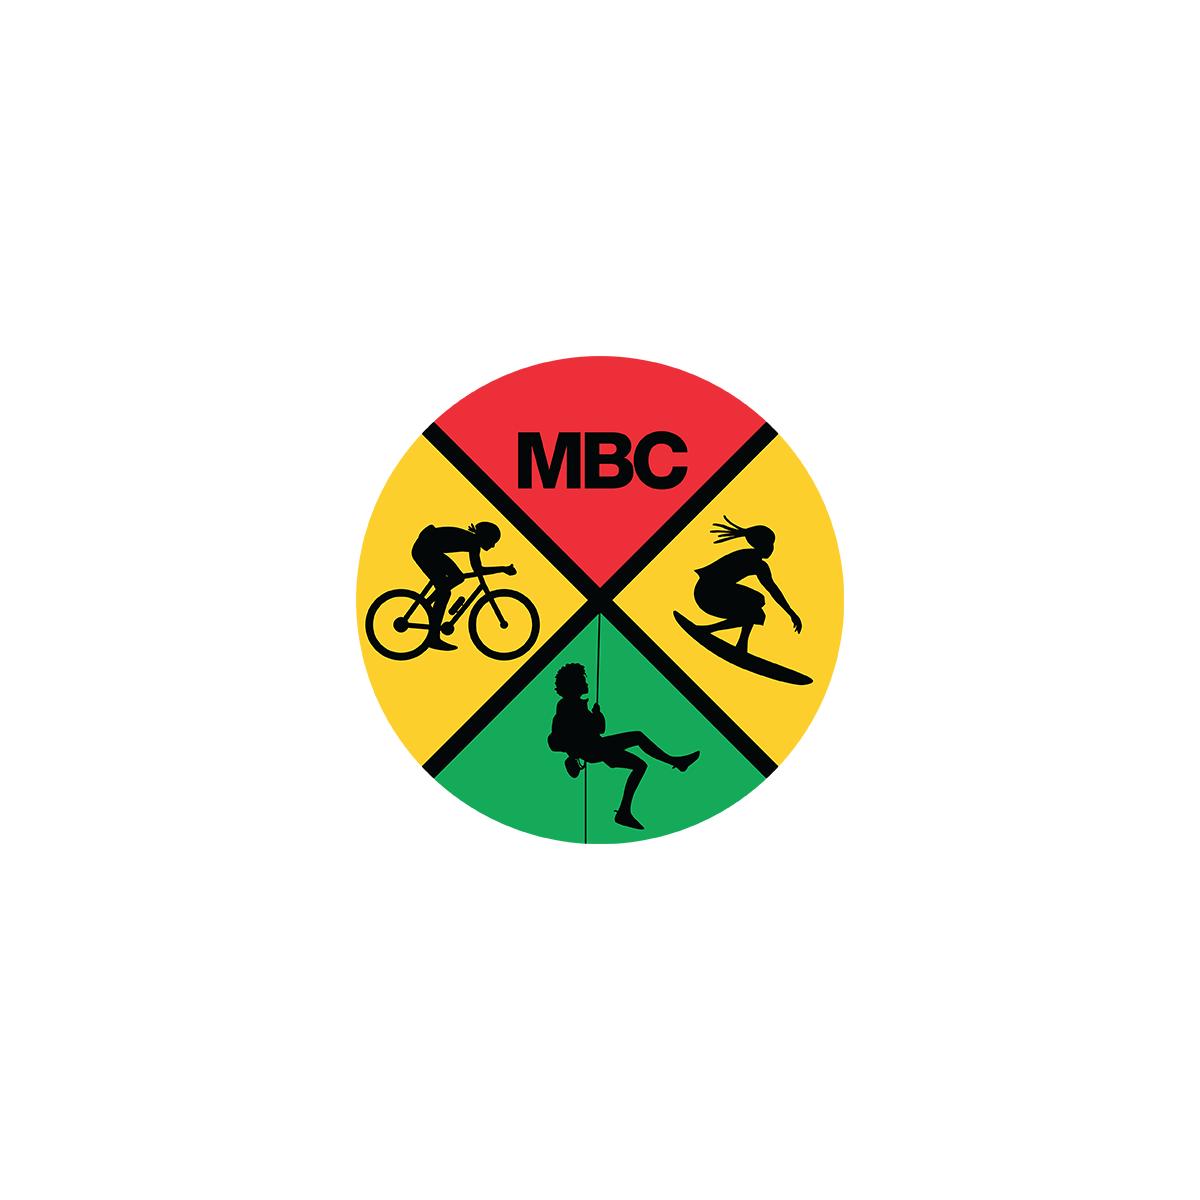 mbc_1.png